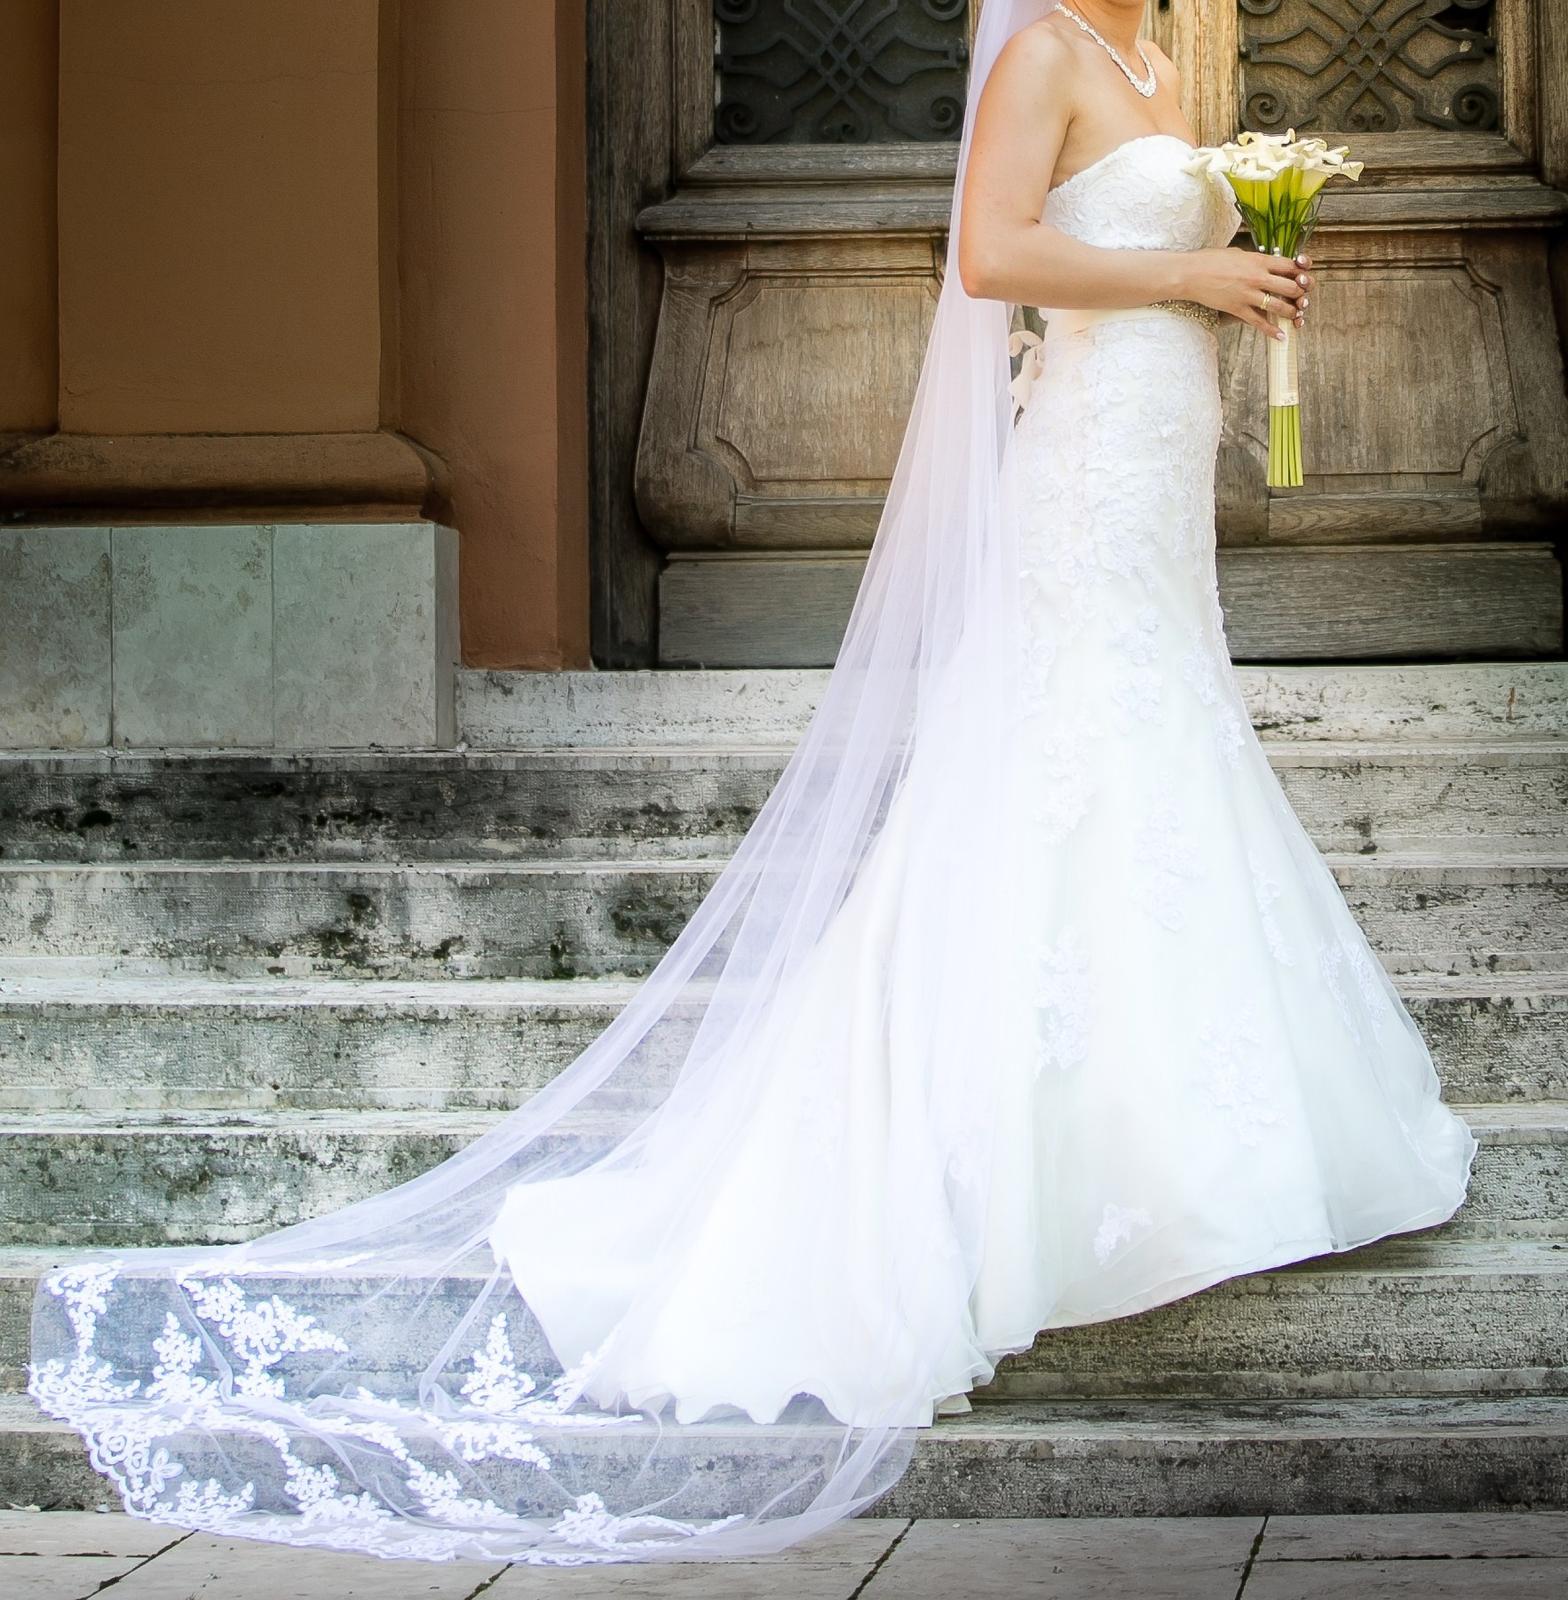 diane legrand 13EM2 svadobne šaty - Obrázok č. 1